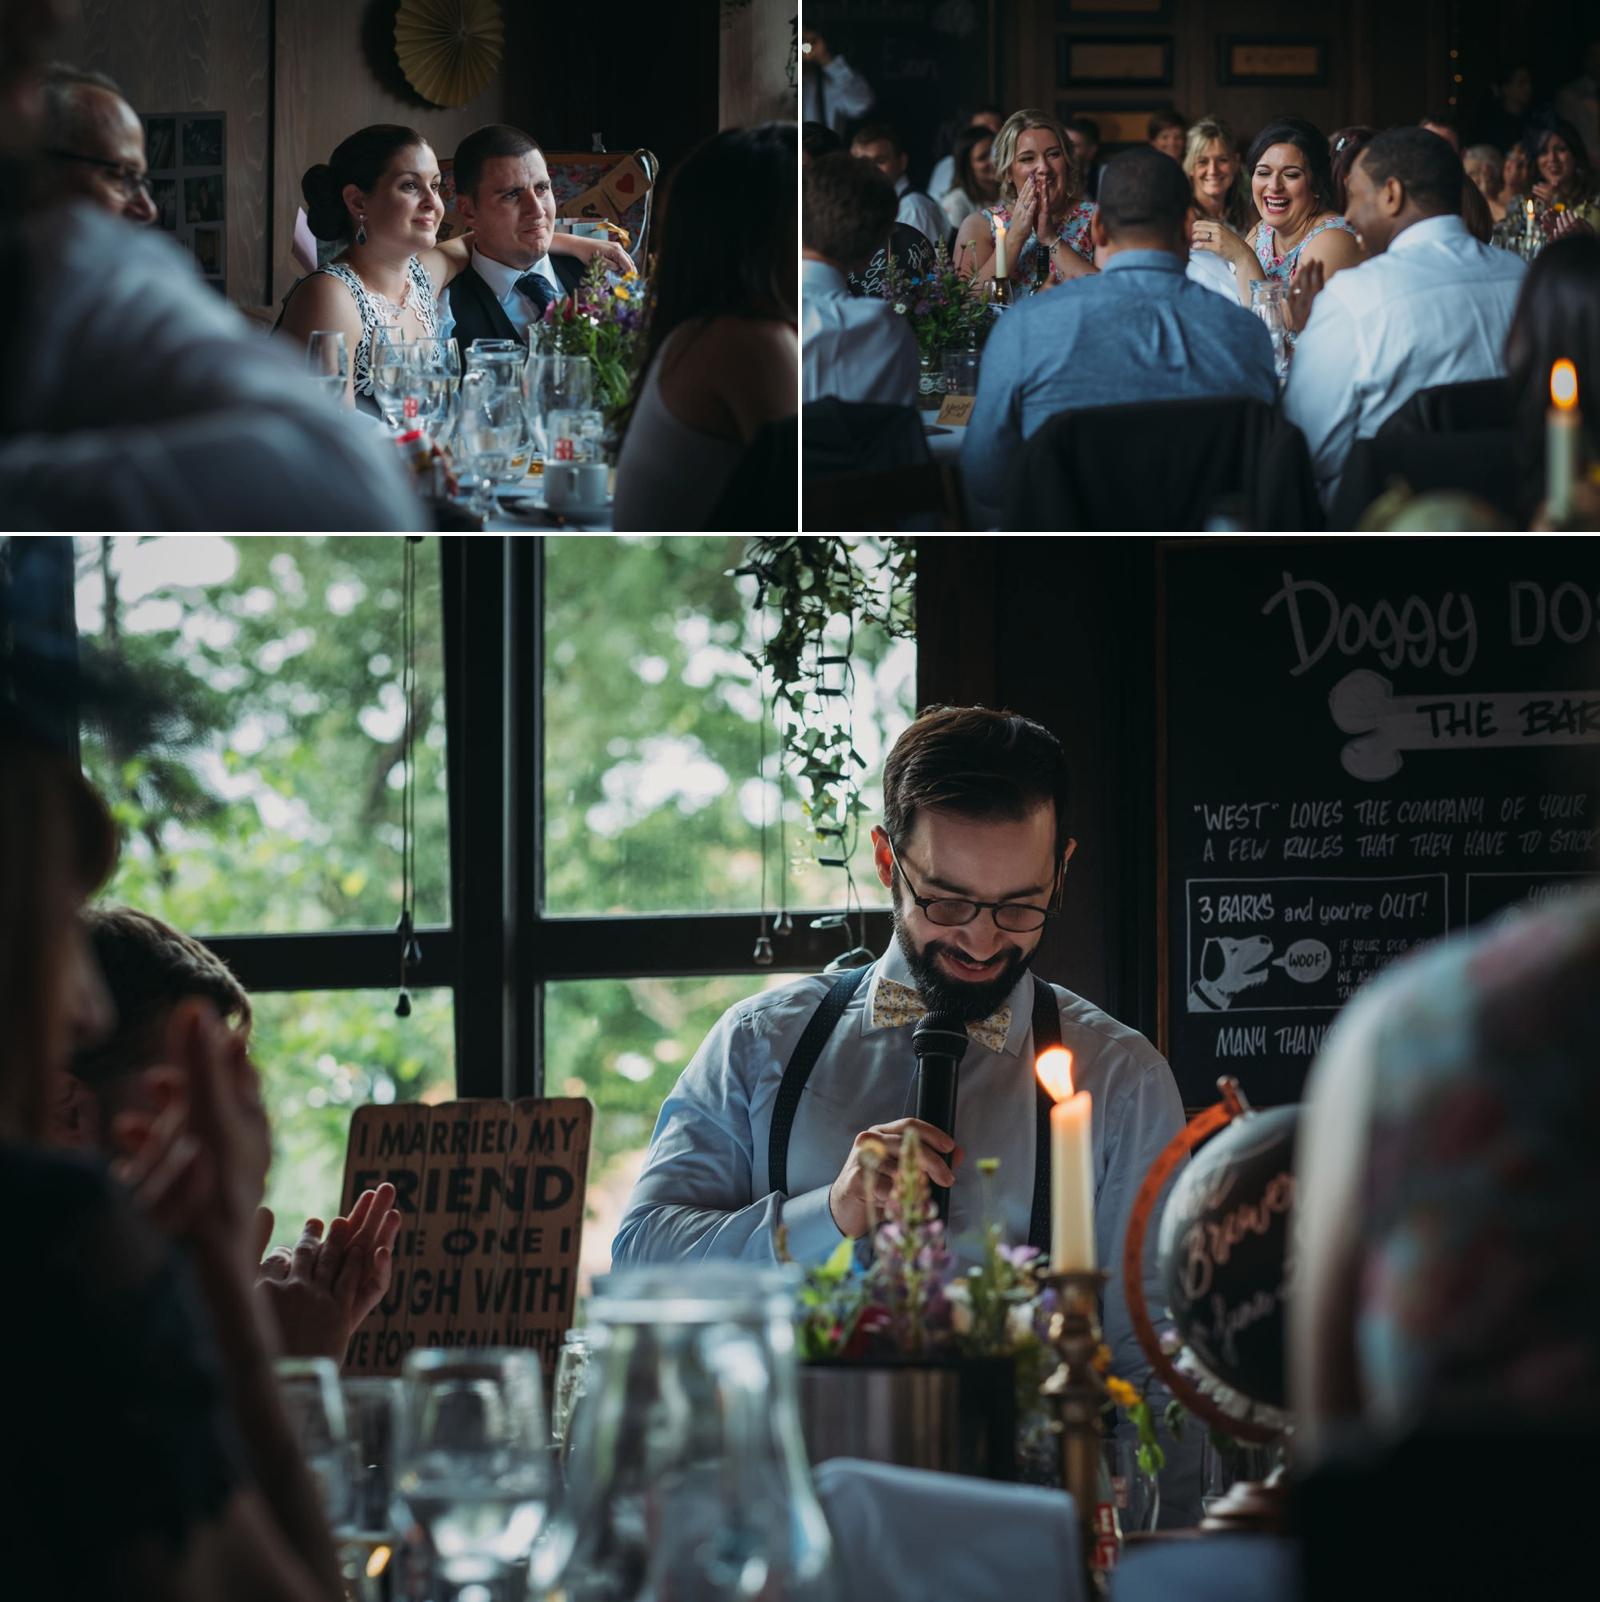 Gillian-Evan-West-Brewery-Jo-Donaldson-Photography-500.jpg